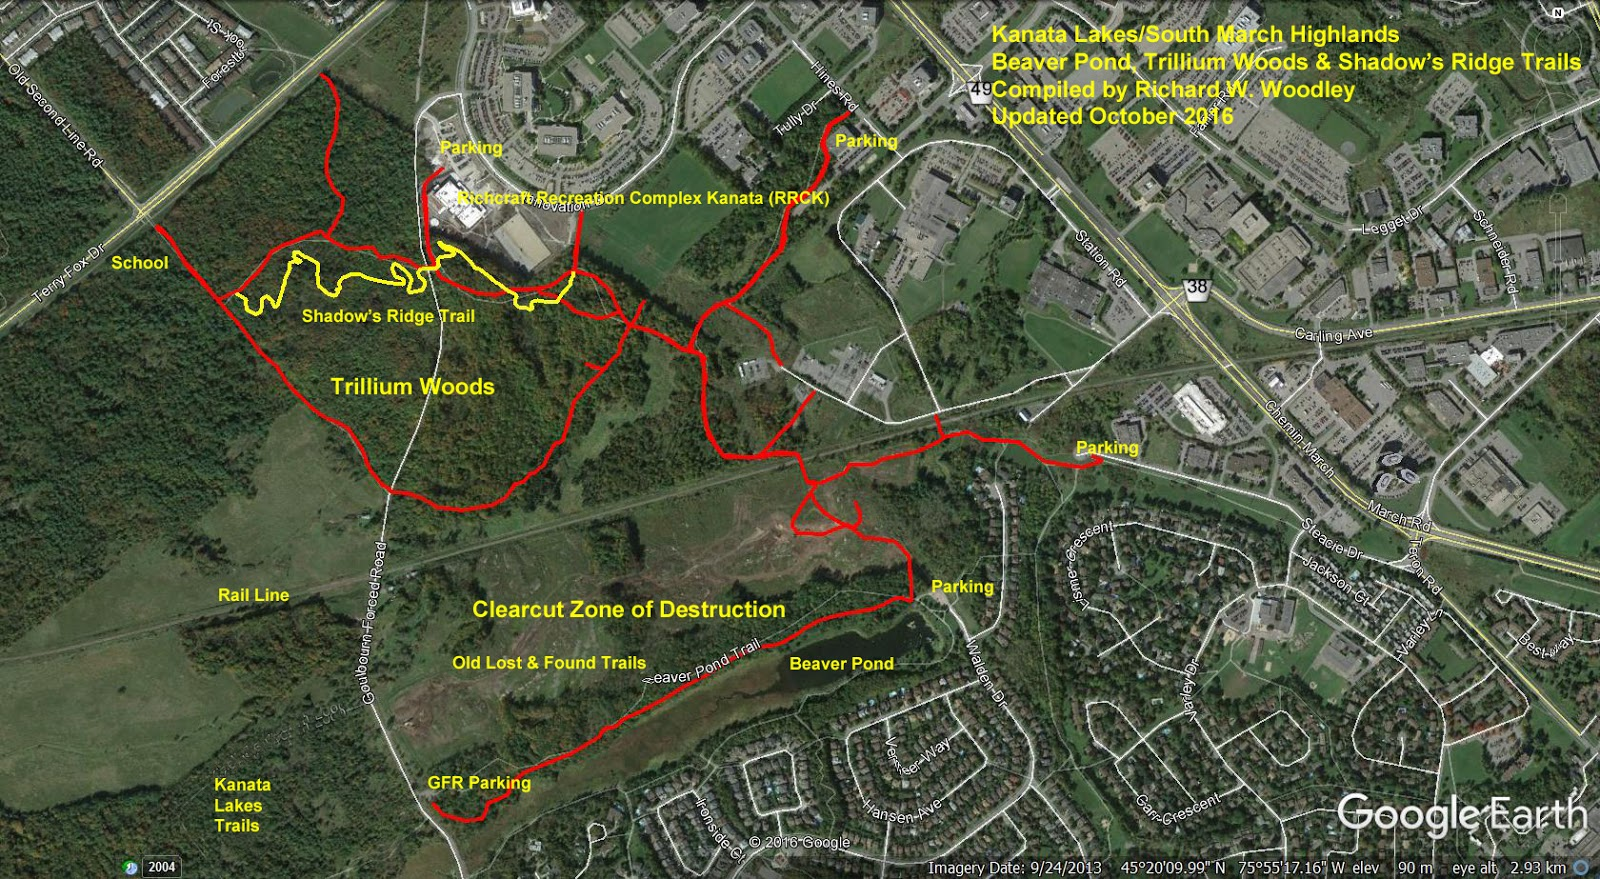 Richards GPS Trail Maps South March Highlands Beaver Pond